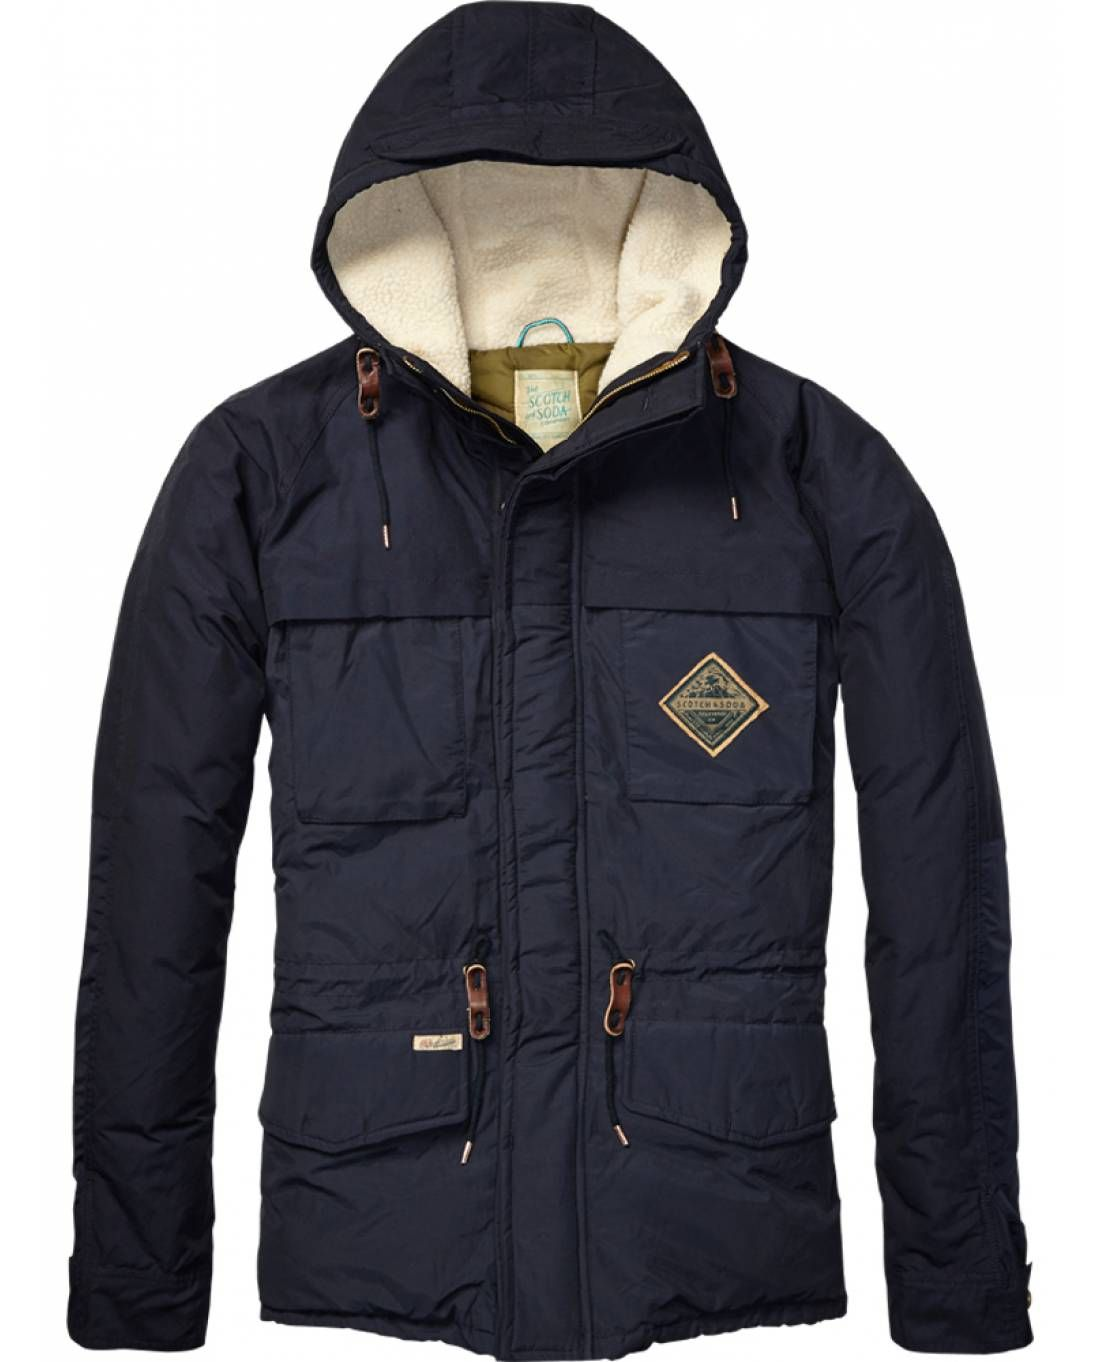 Colour Block Down Jacket  Mens Clothing  Jackets at Scotch  Soda - Official Scotch  Soda Online Fashion  Apparel Shops